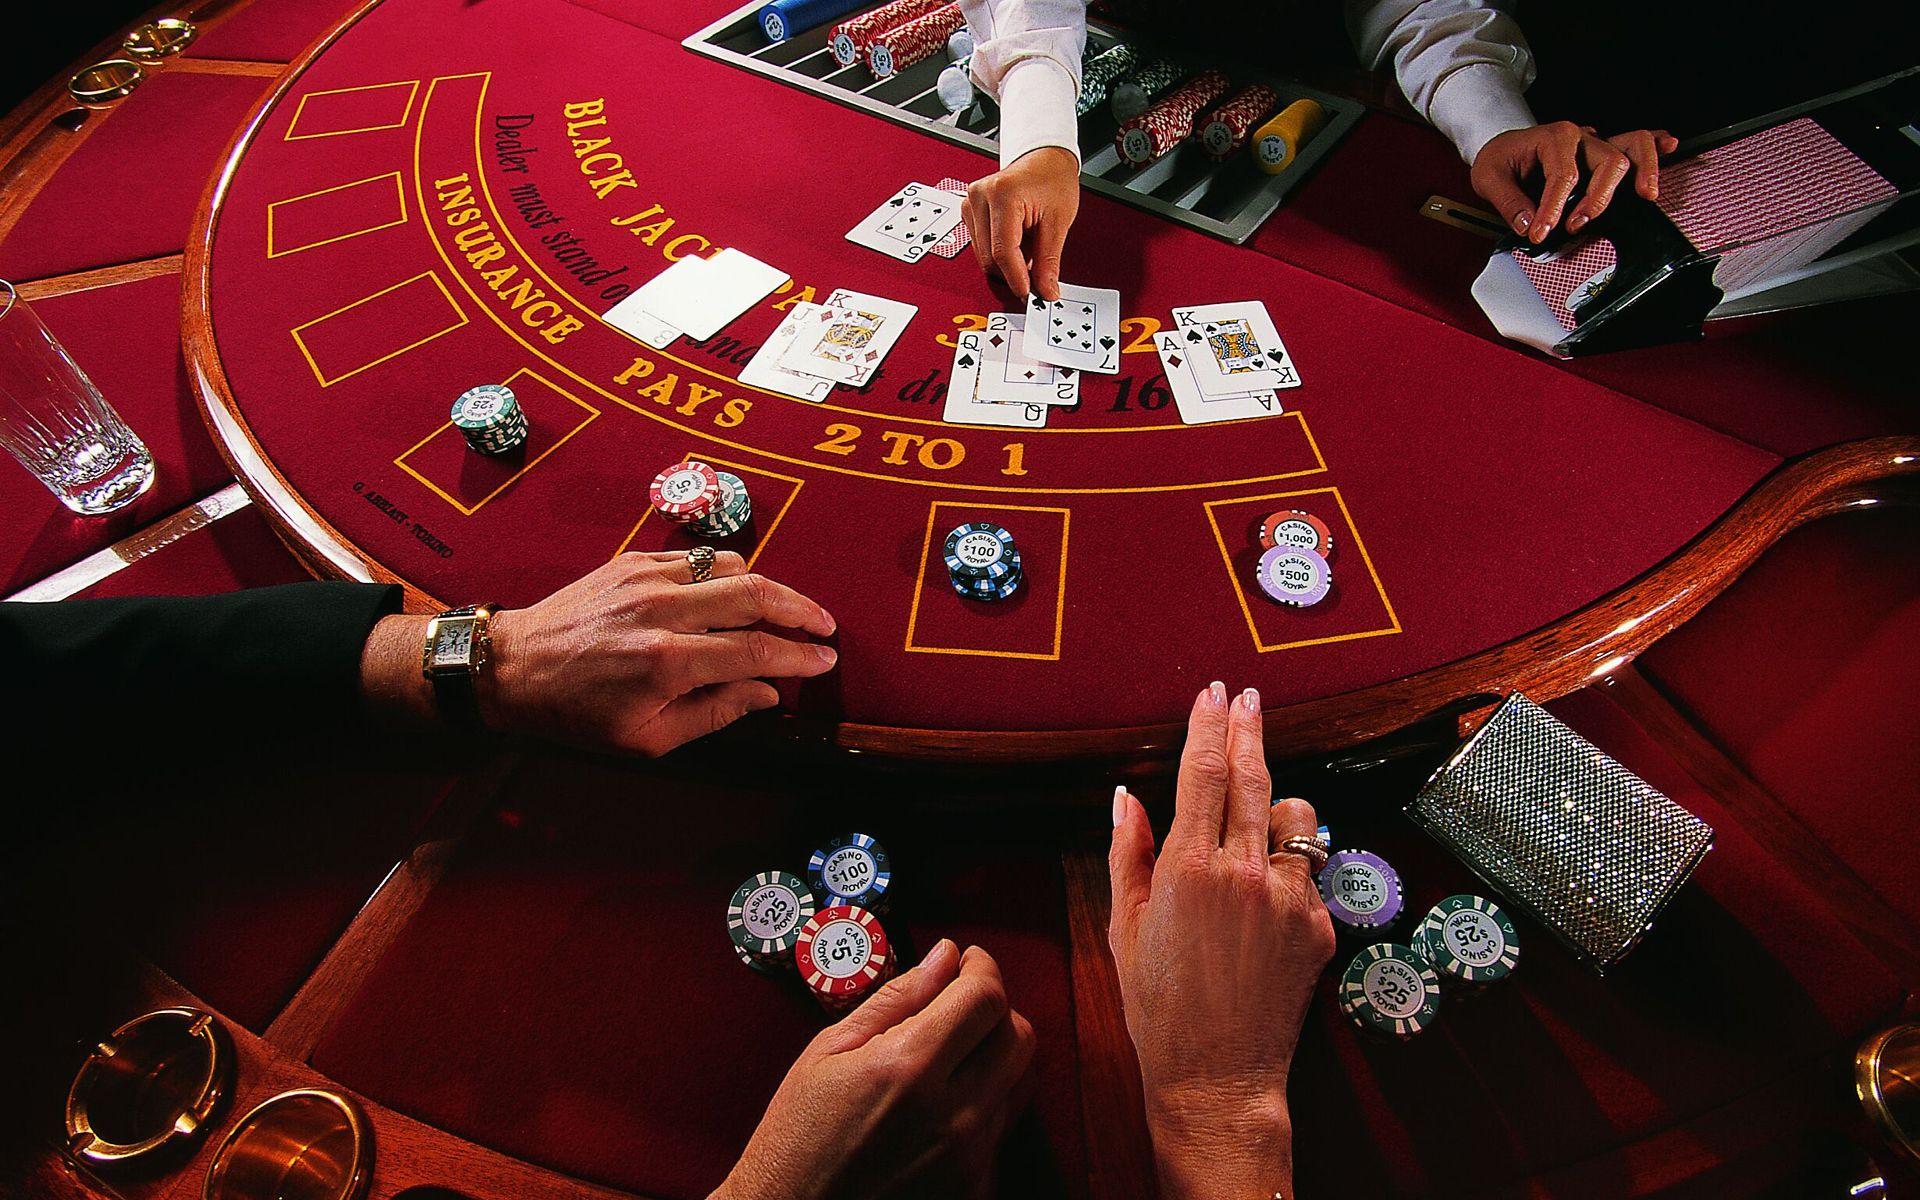 Las vegas casinos blackjack